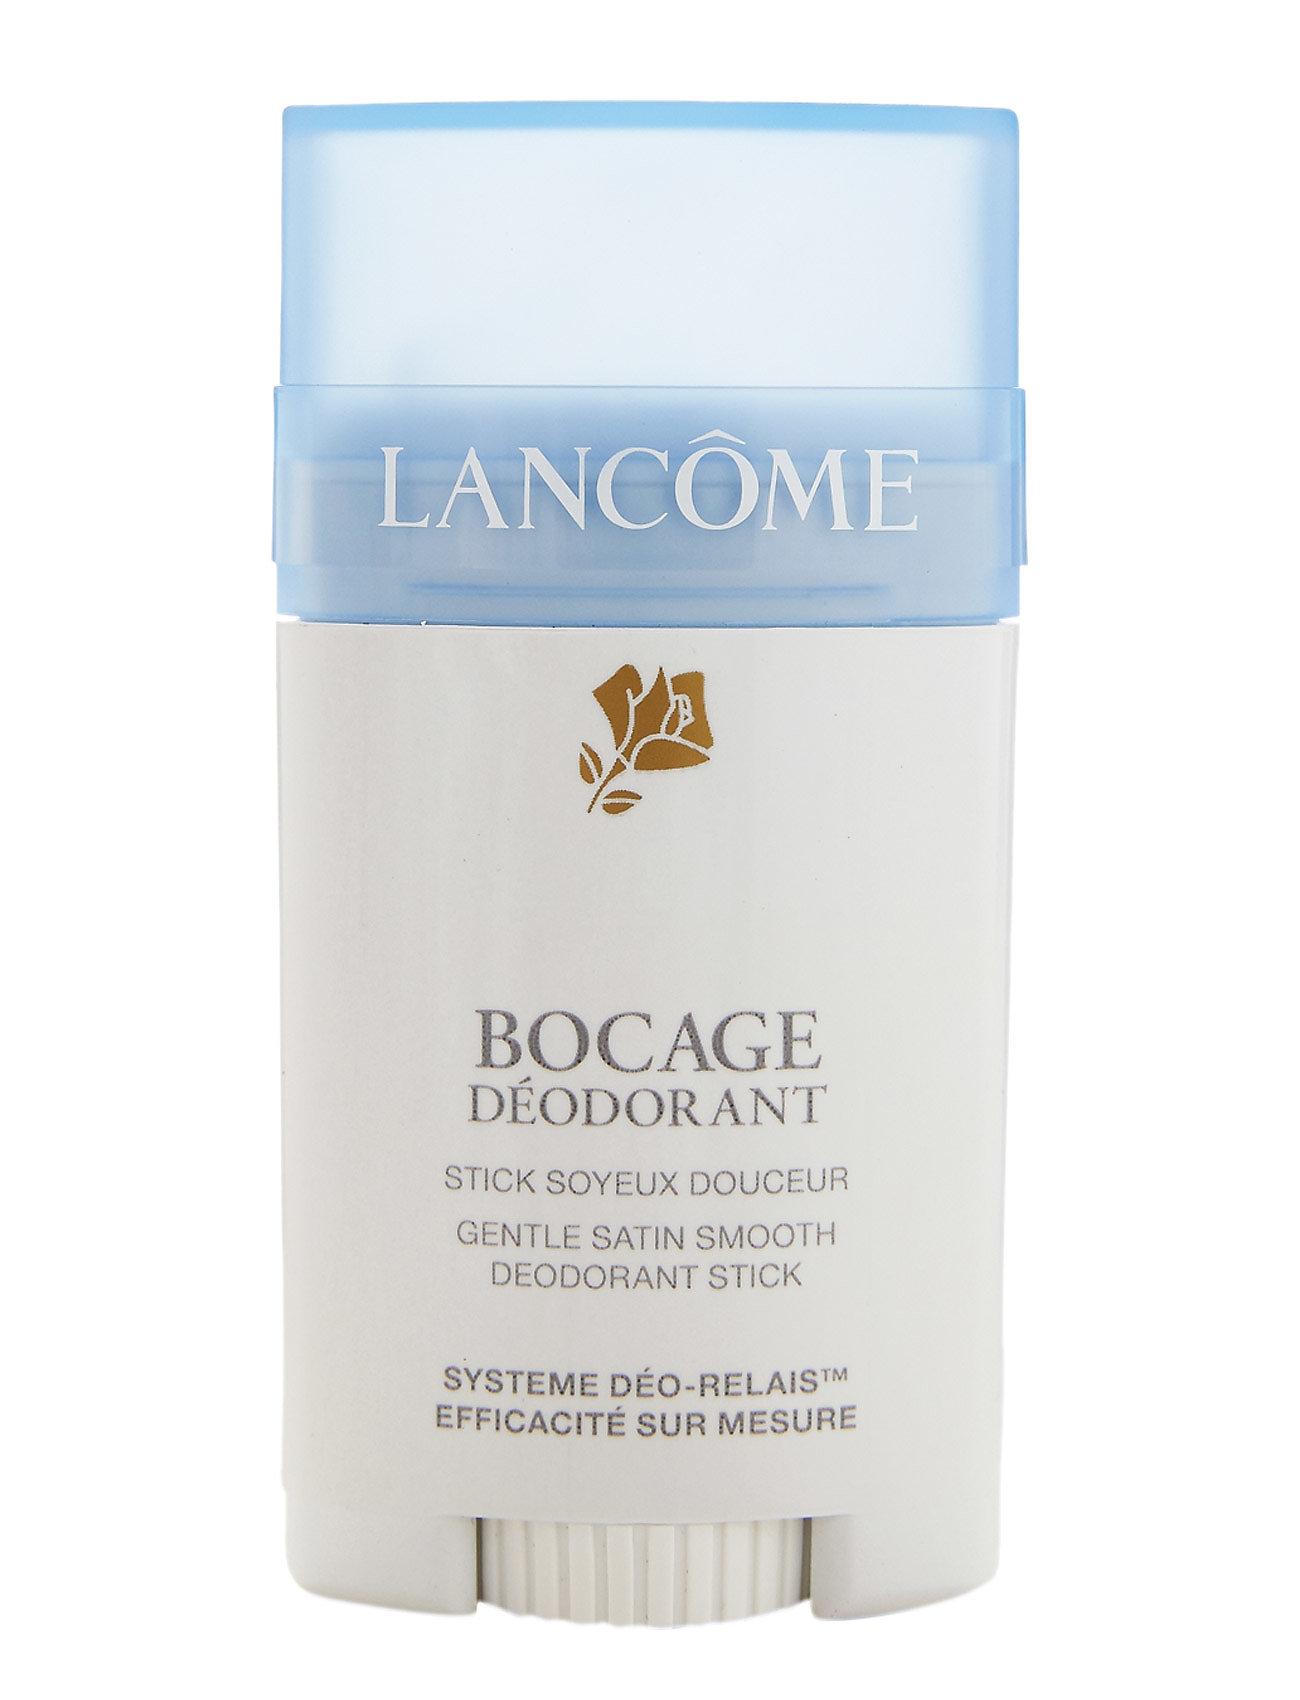 Lancôme Bocage Deo Stick 40 ml - CLEAR